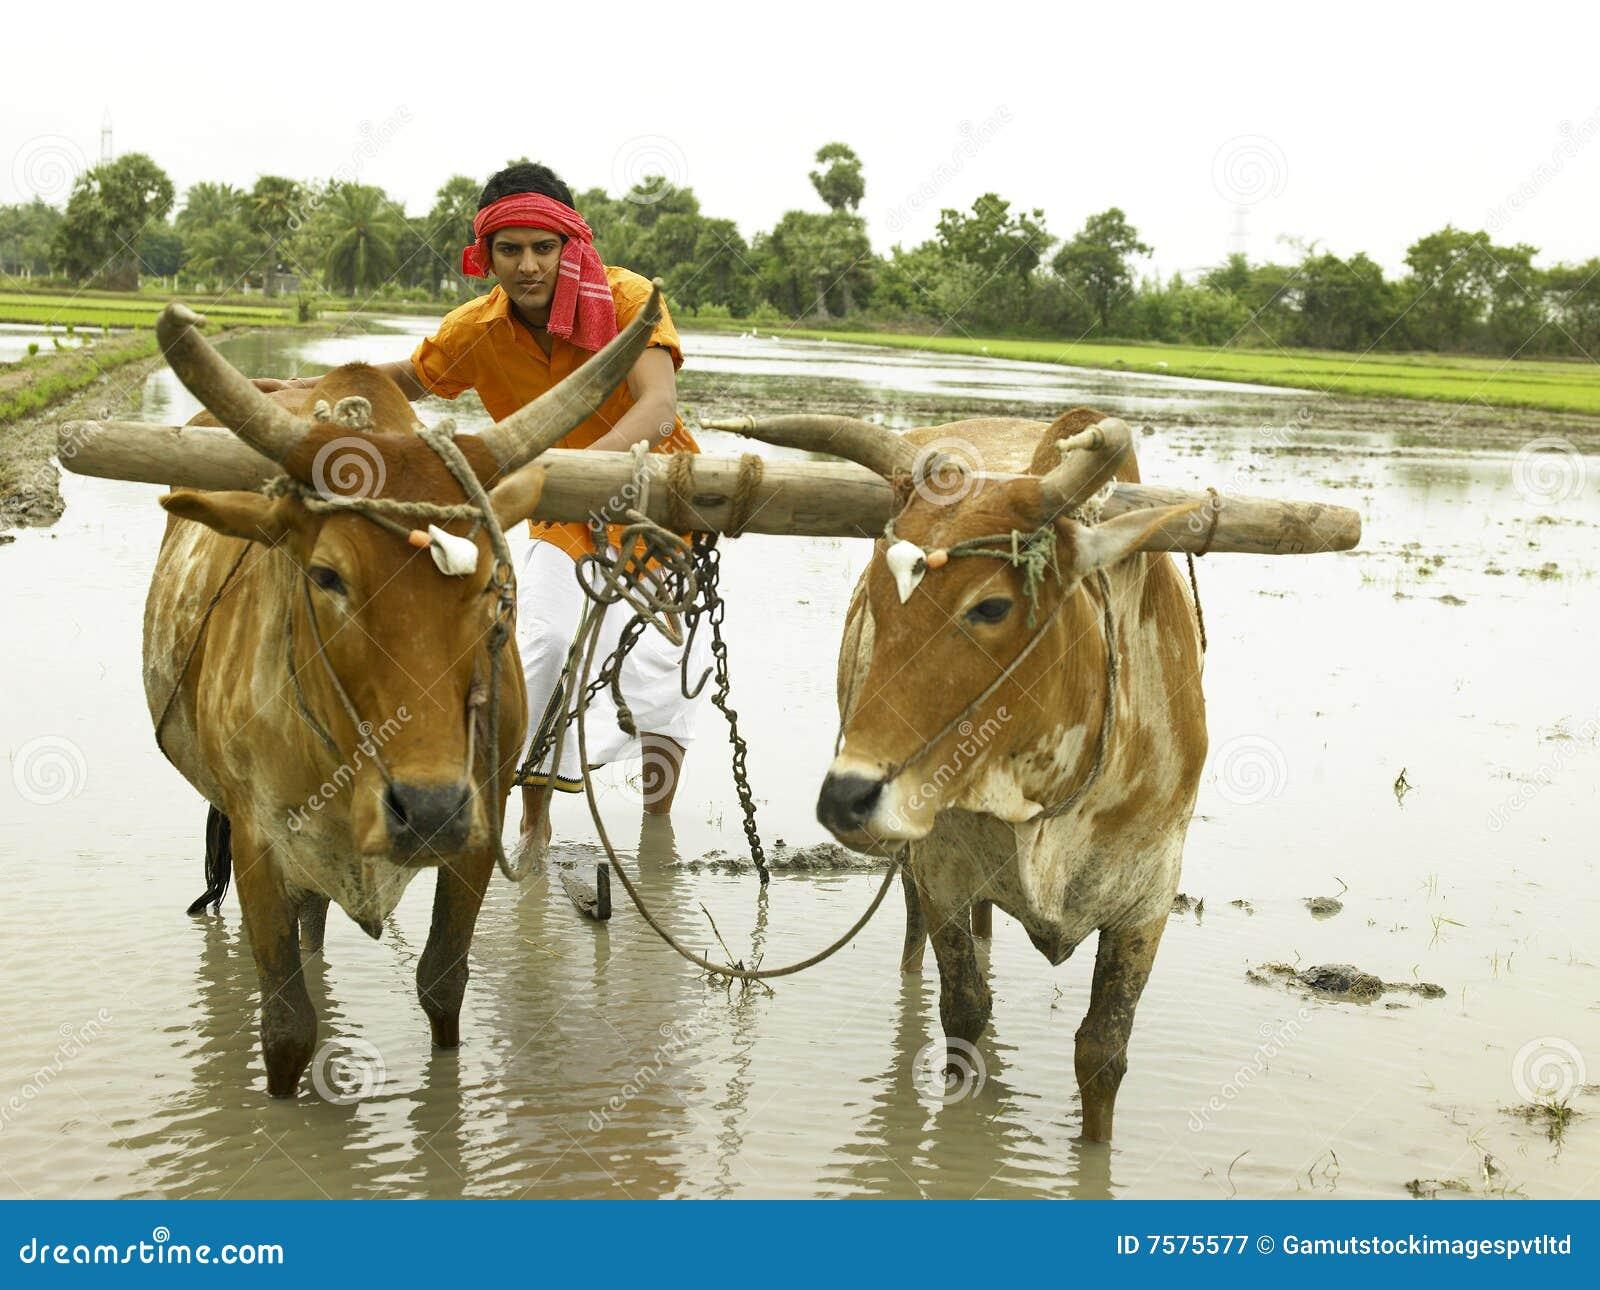 essay on a farmer